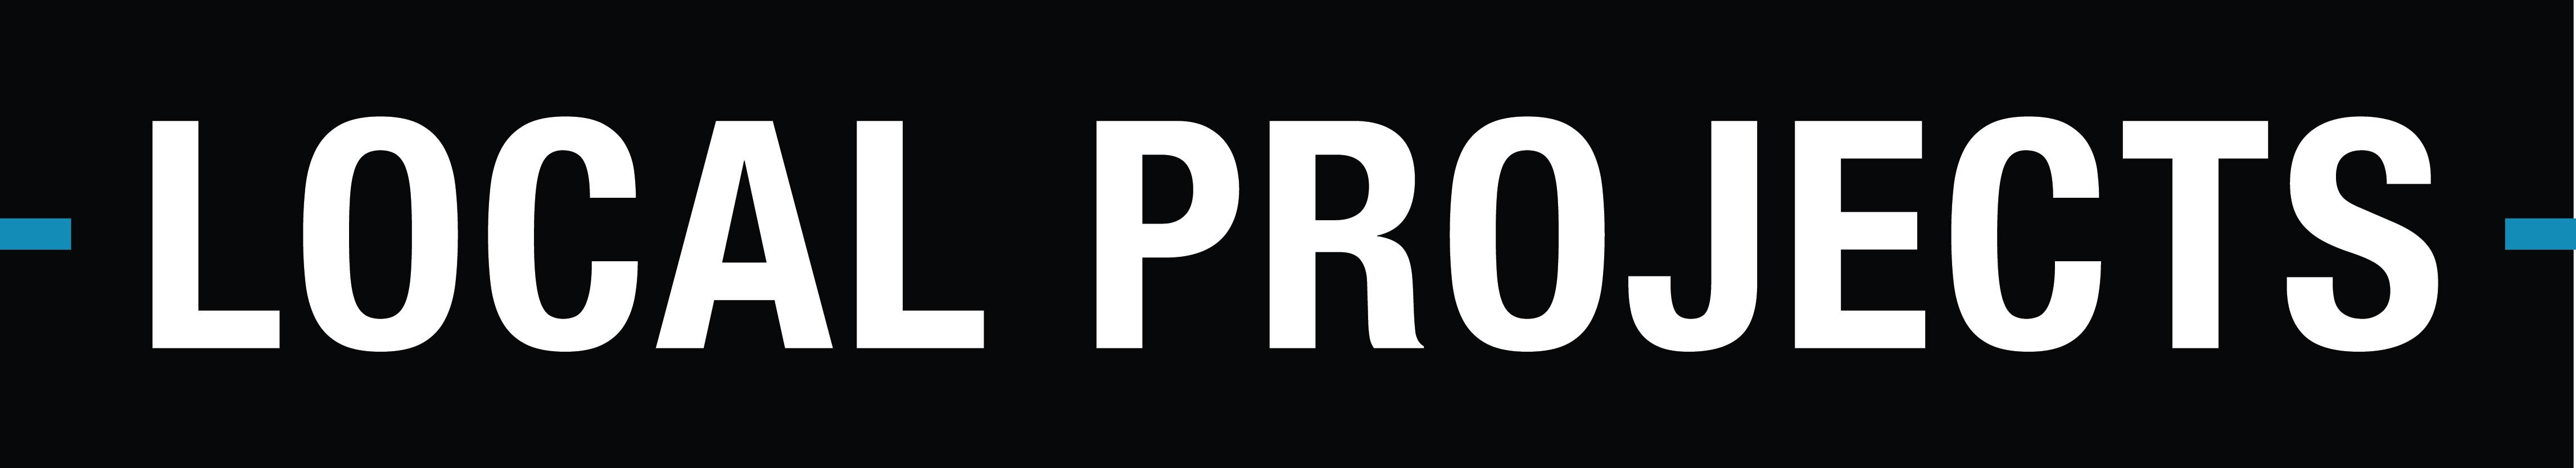 LocalProgectsHeader-01